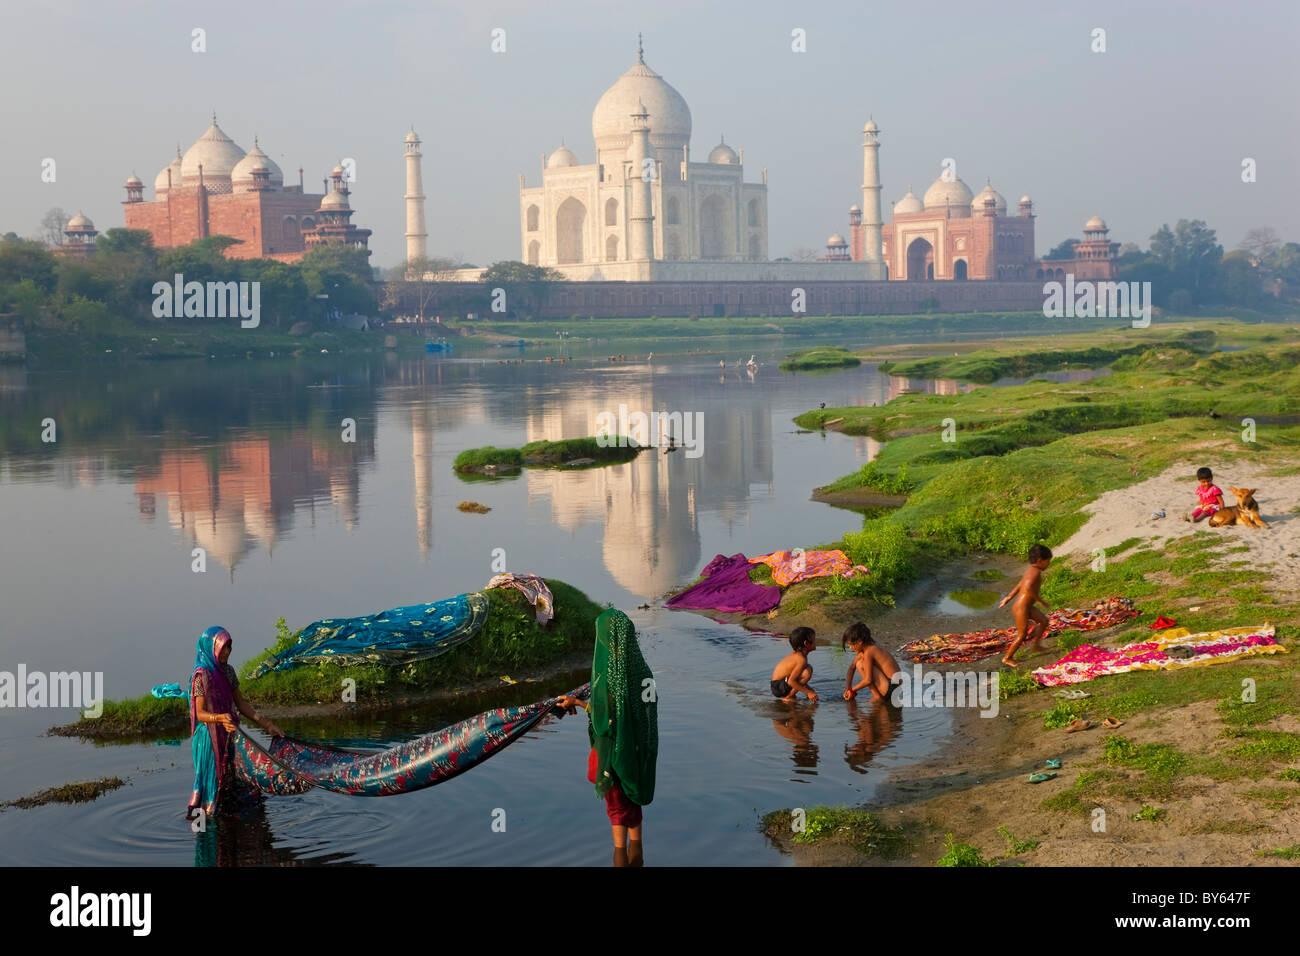 Washing & Taj Mahal on the banks of the River Yamuna, Agra, India - Stock Image